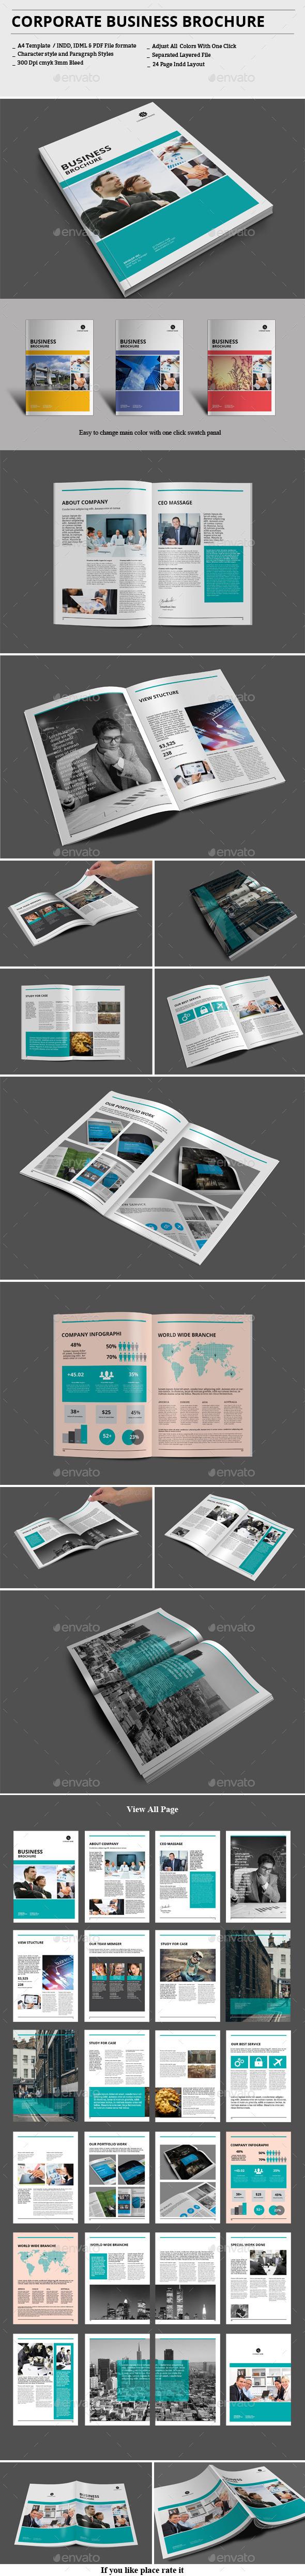 GraphicRiver Corporate Business Brochure 9219305